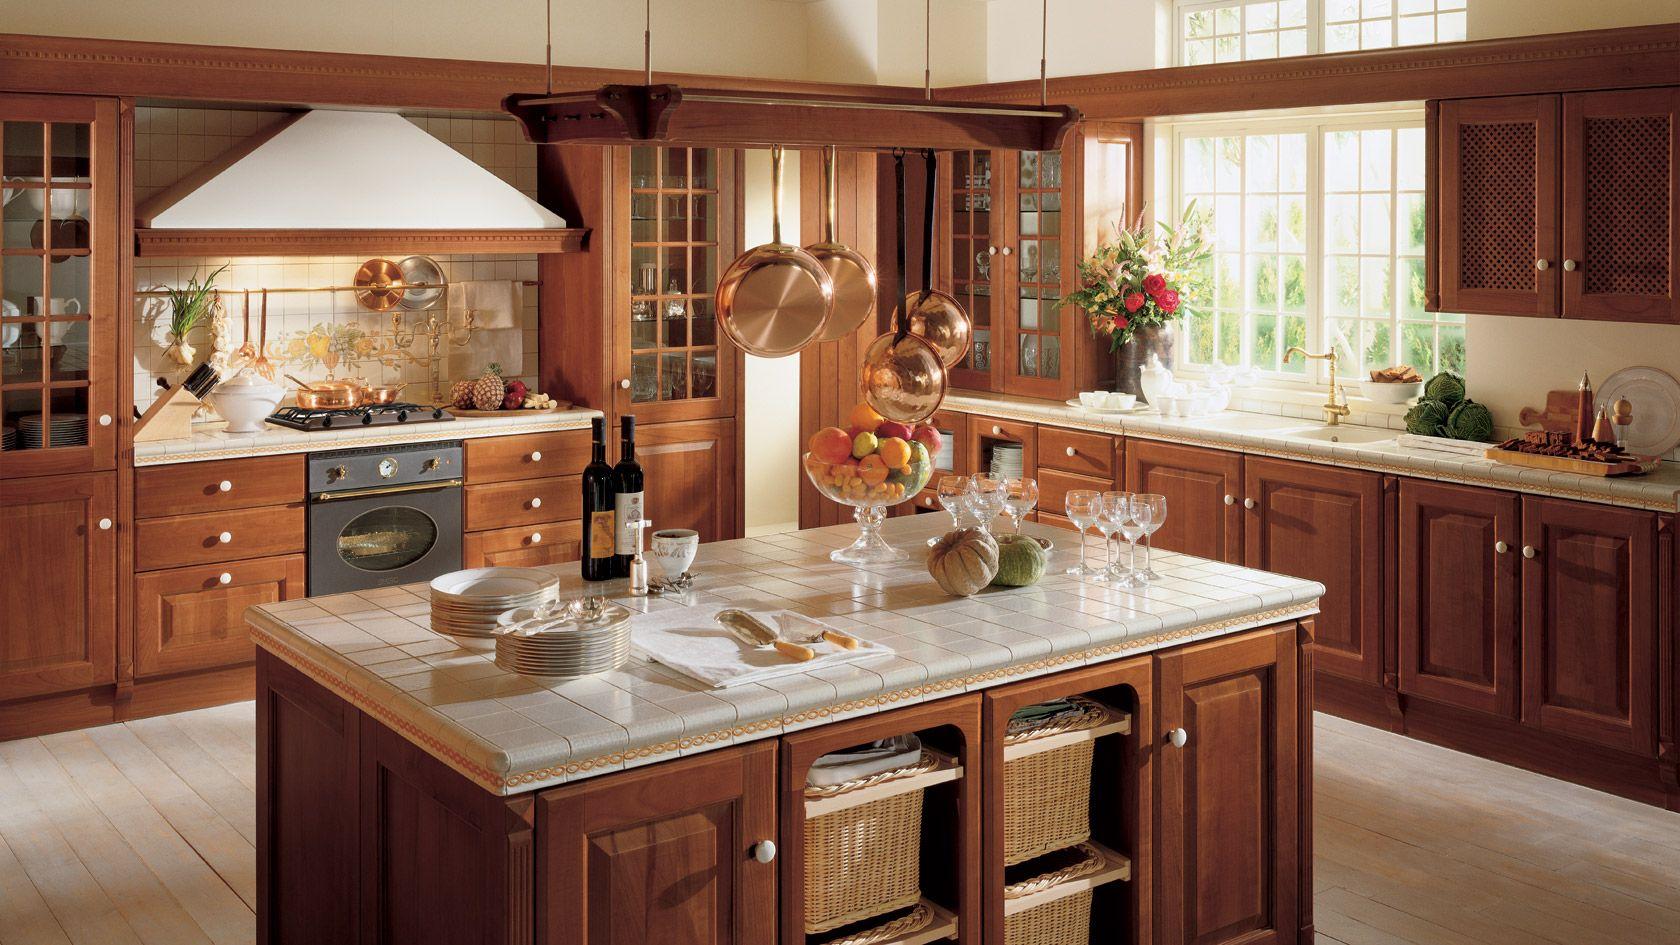 Cucina Baltimora Scavolini | Interior design | Pinterest | Baltimora ...